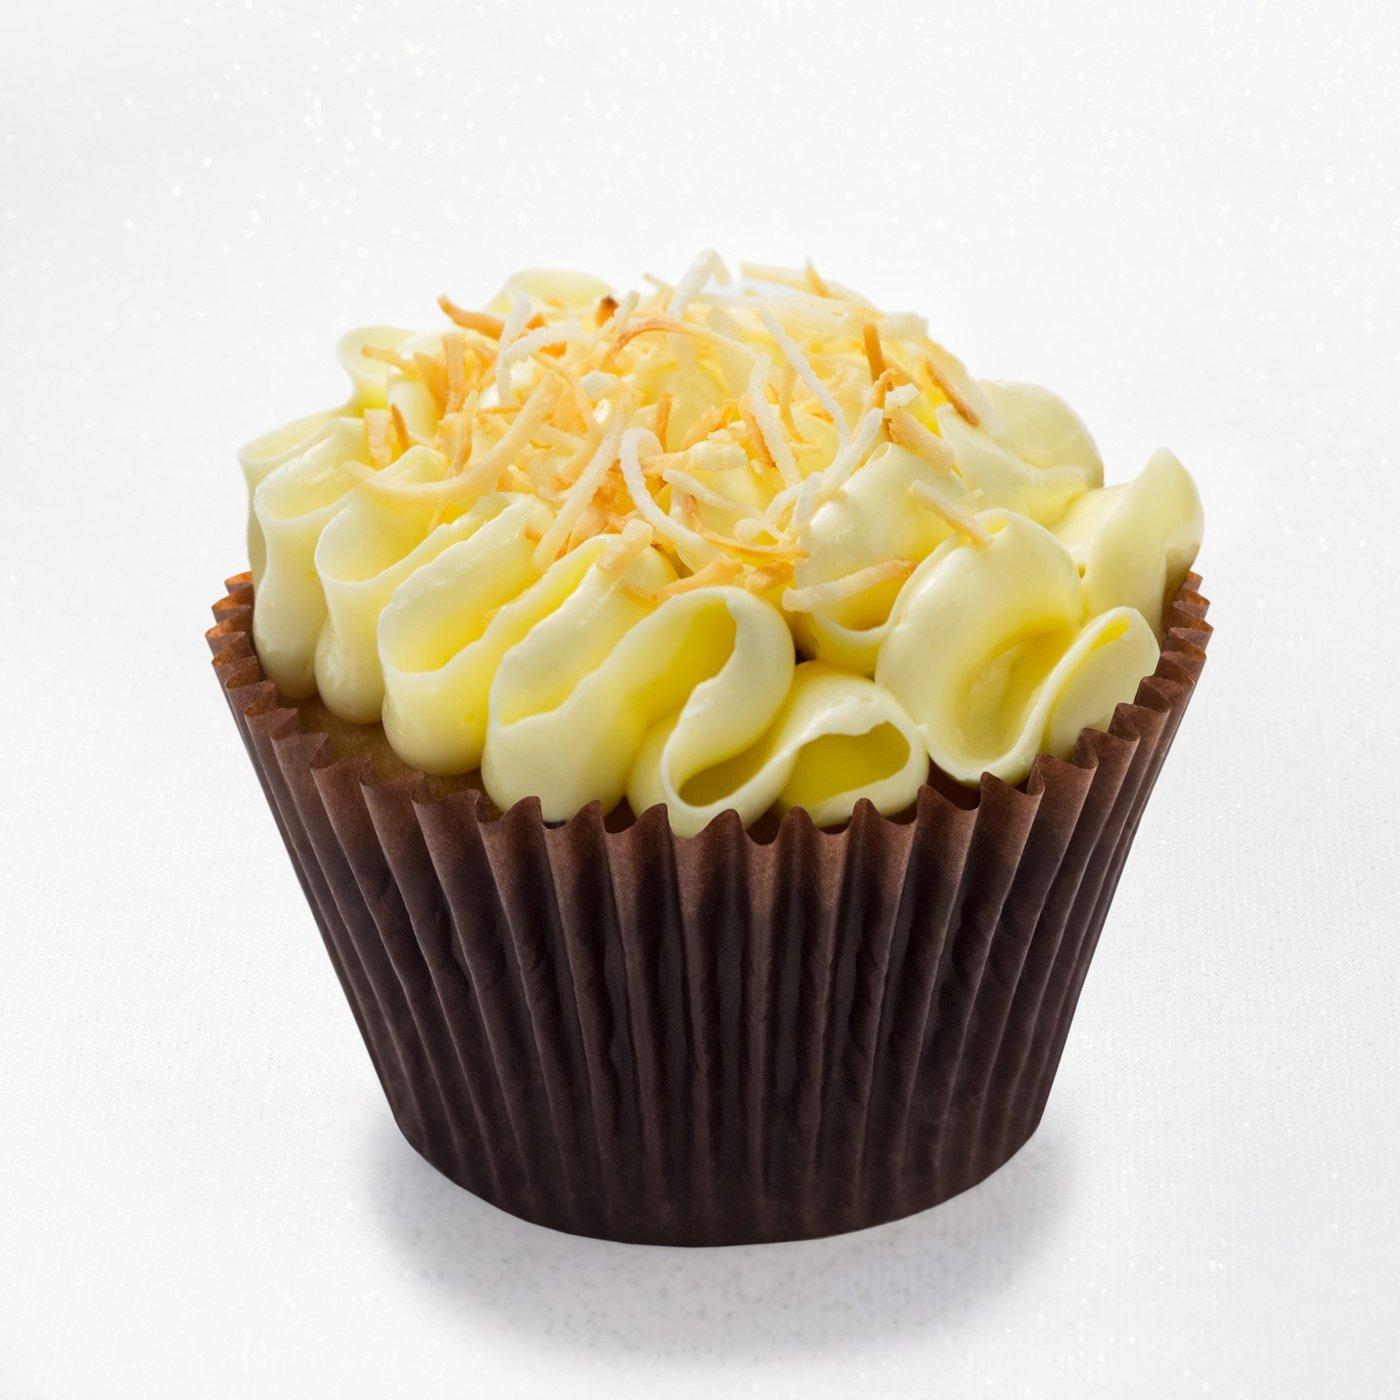 Pina colada - caramelized pineapple cupcake